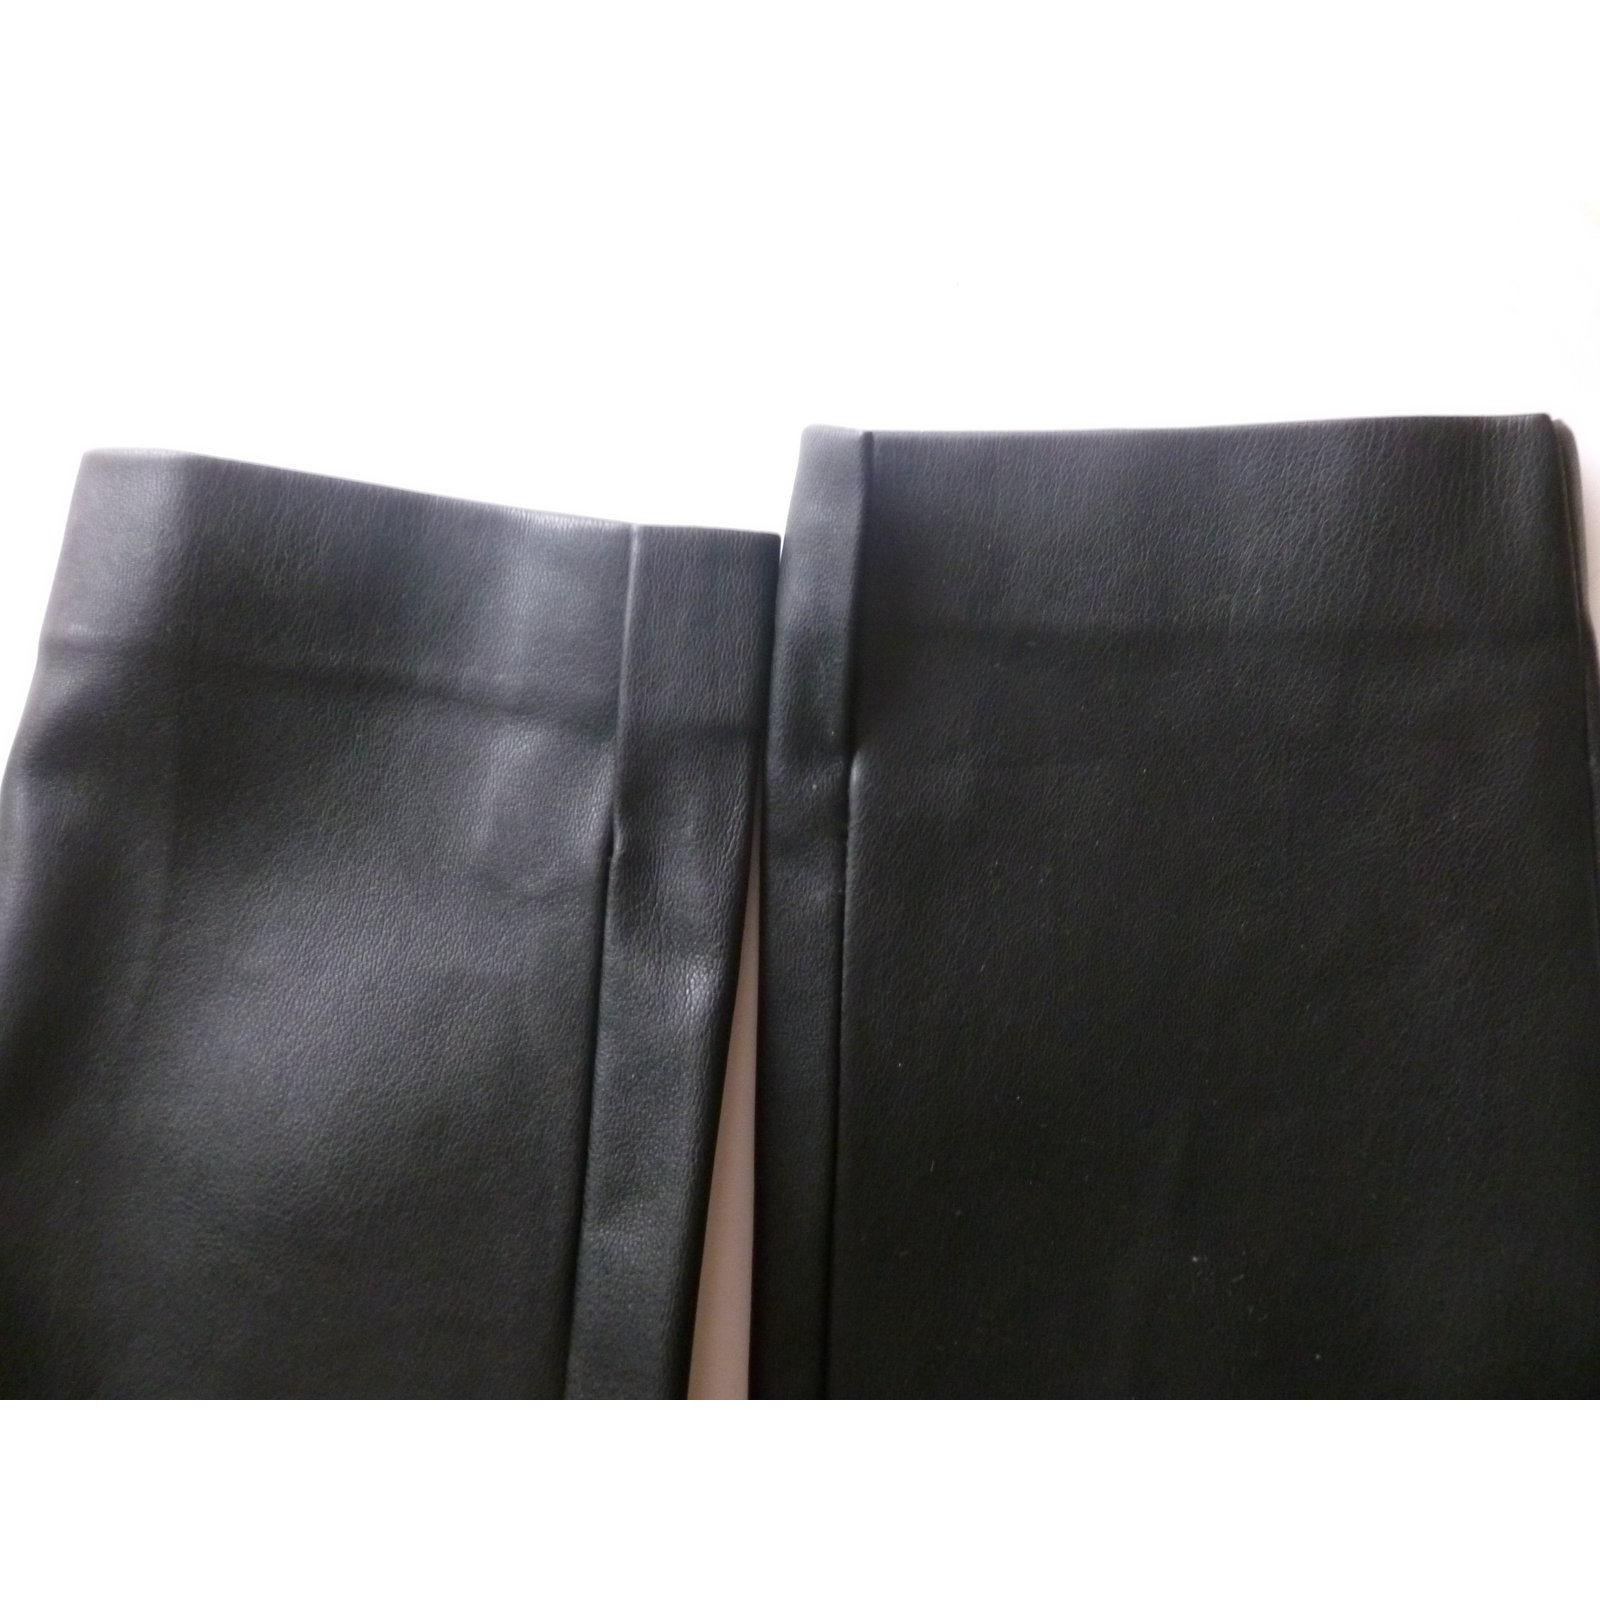 8cc2ec13 Zara Faux leather biker pants Pants, leggings Polyurethane Black ref.86235  - Joli Closet